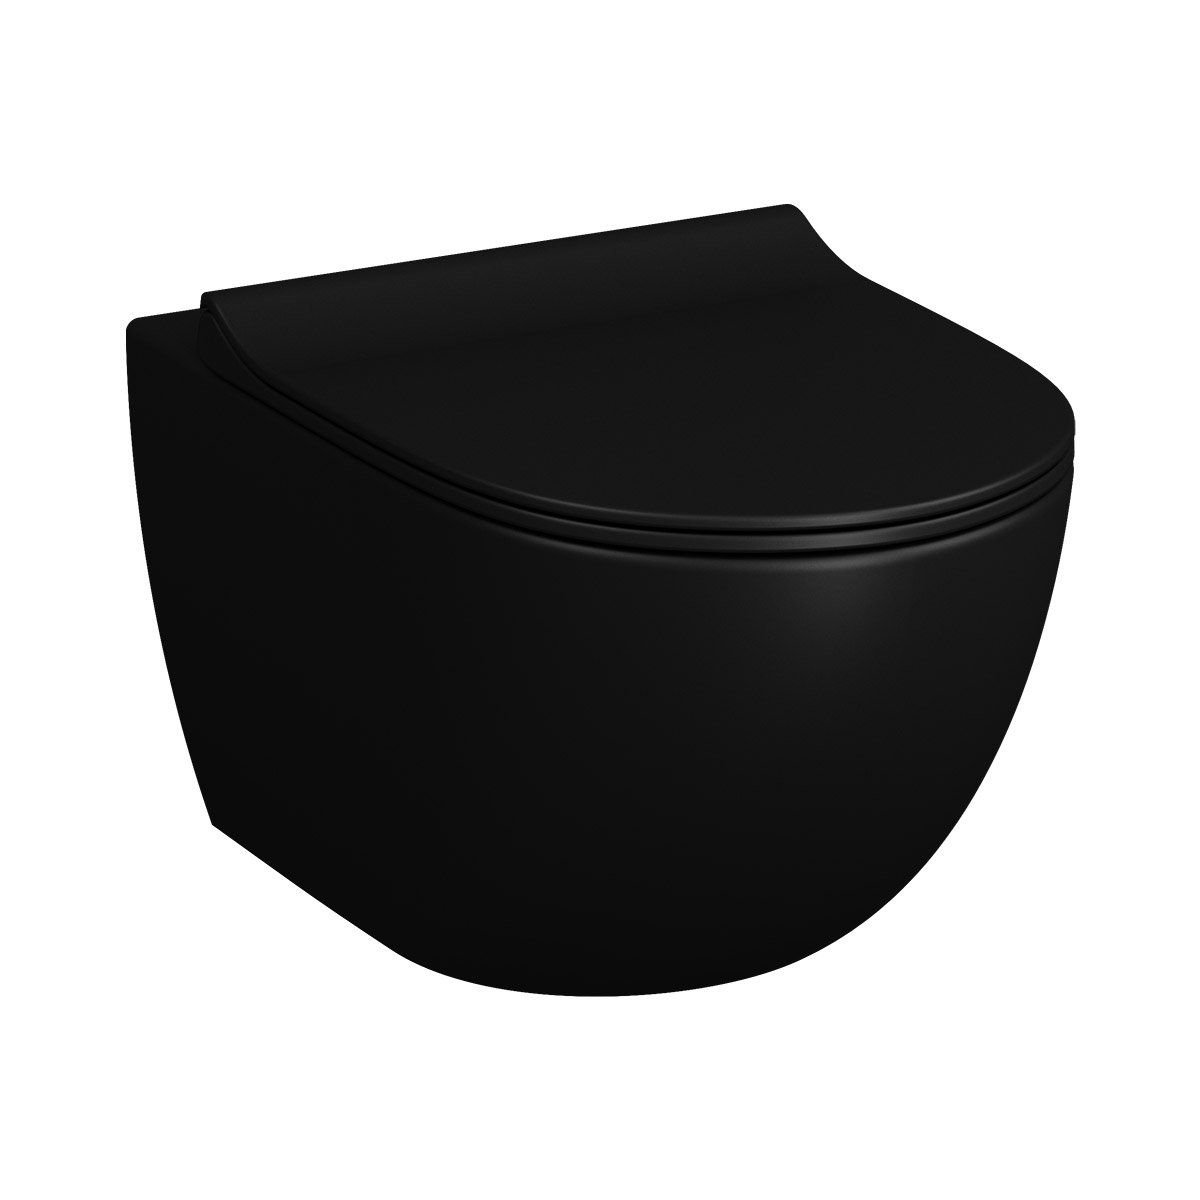 Sento Wand-WC VitrA Flush 2.0 mit Bidetfunktion, Schwarz Matt